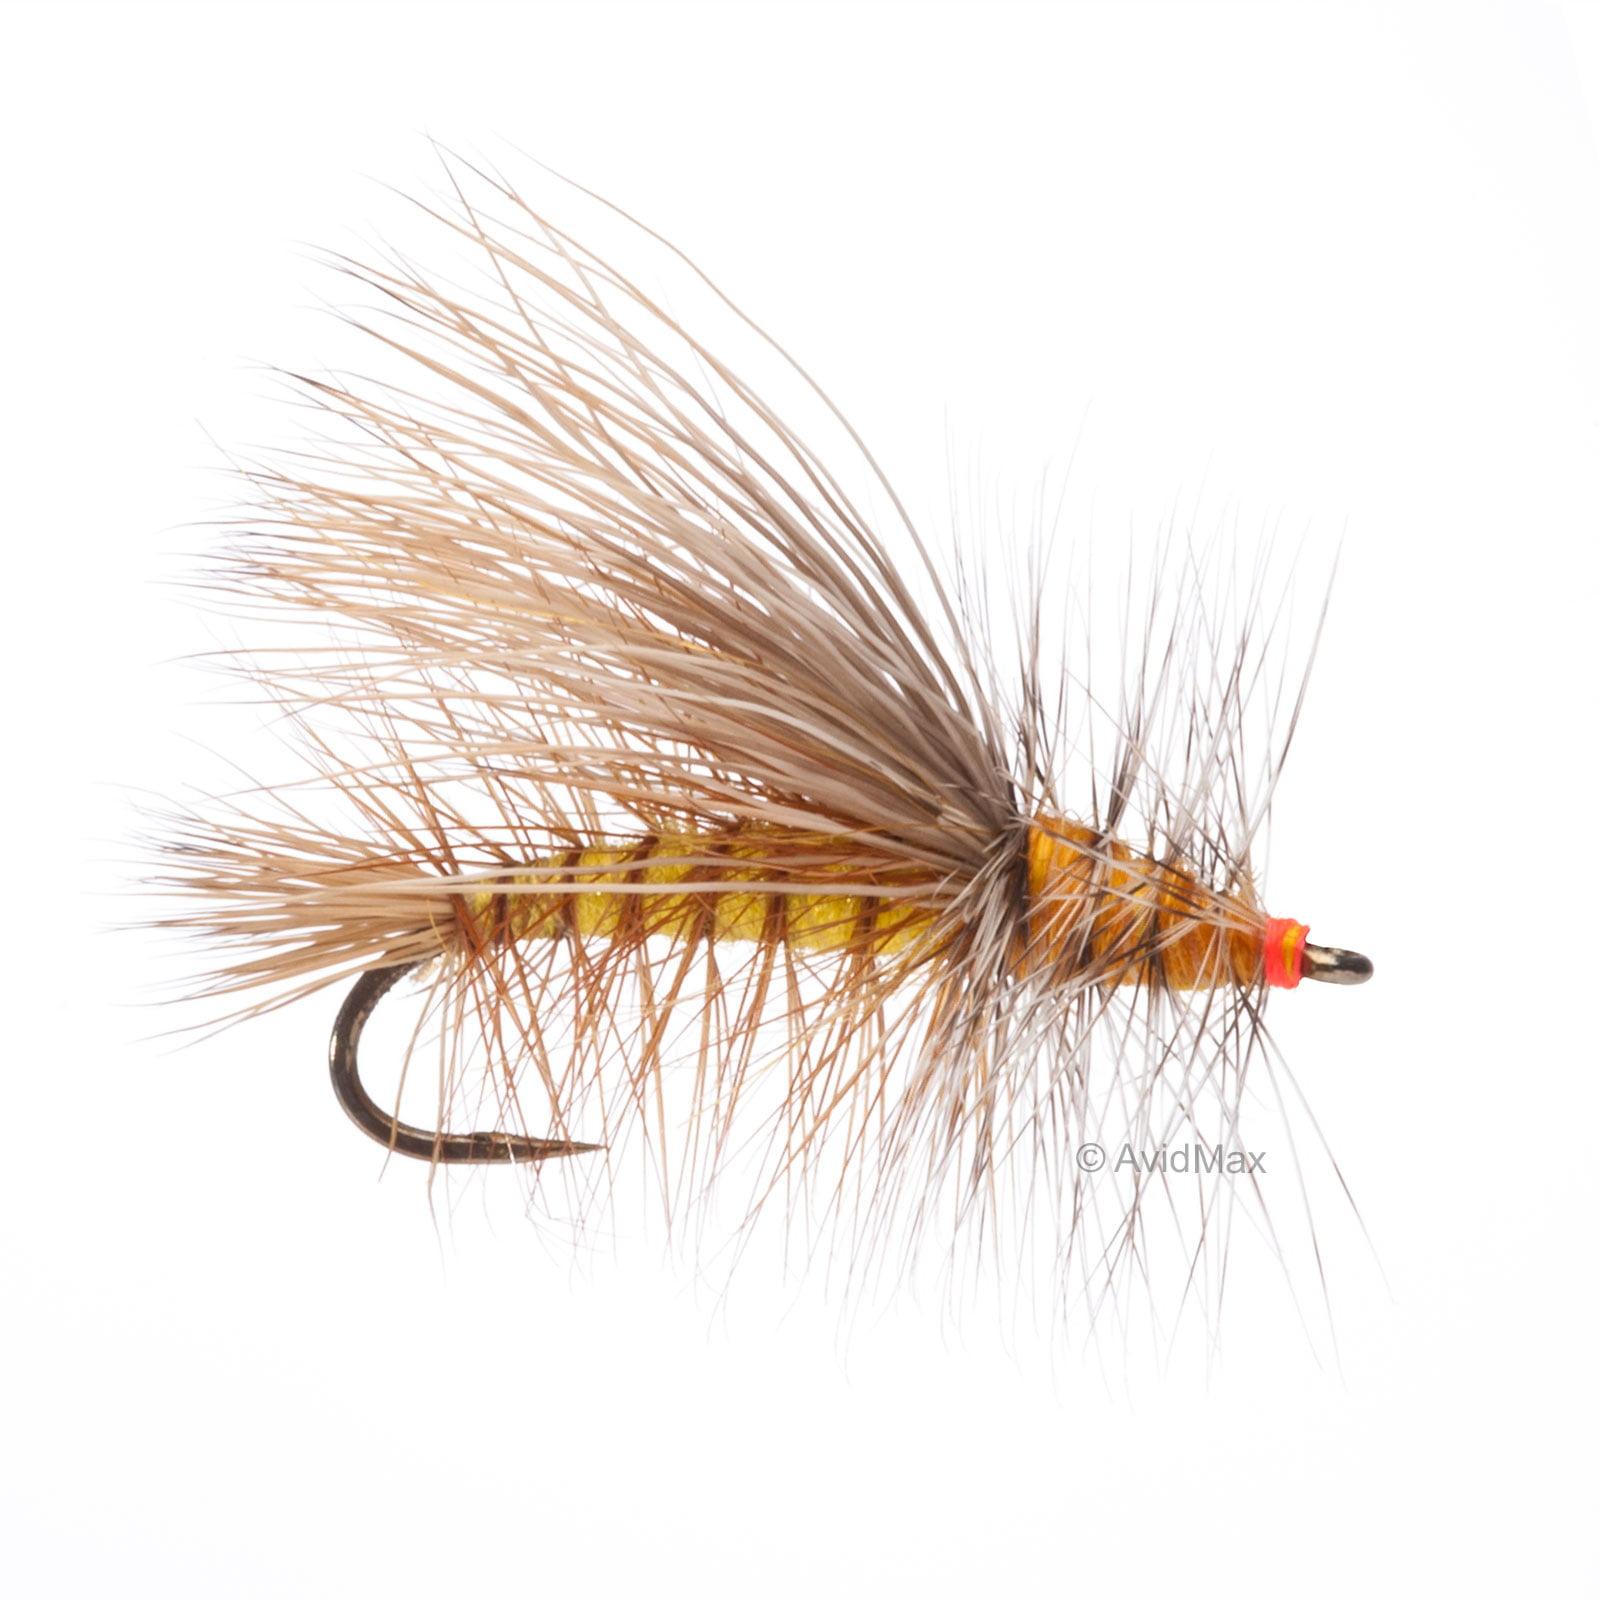 Umpqua Stimulator Kaufmann Barbless Yellow Fly Fishing Dry Flies Multi-packs